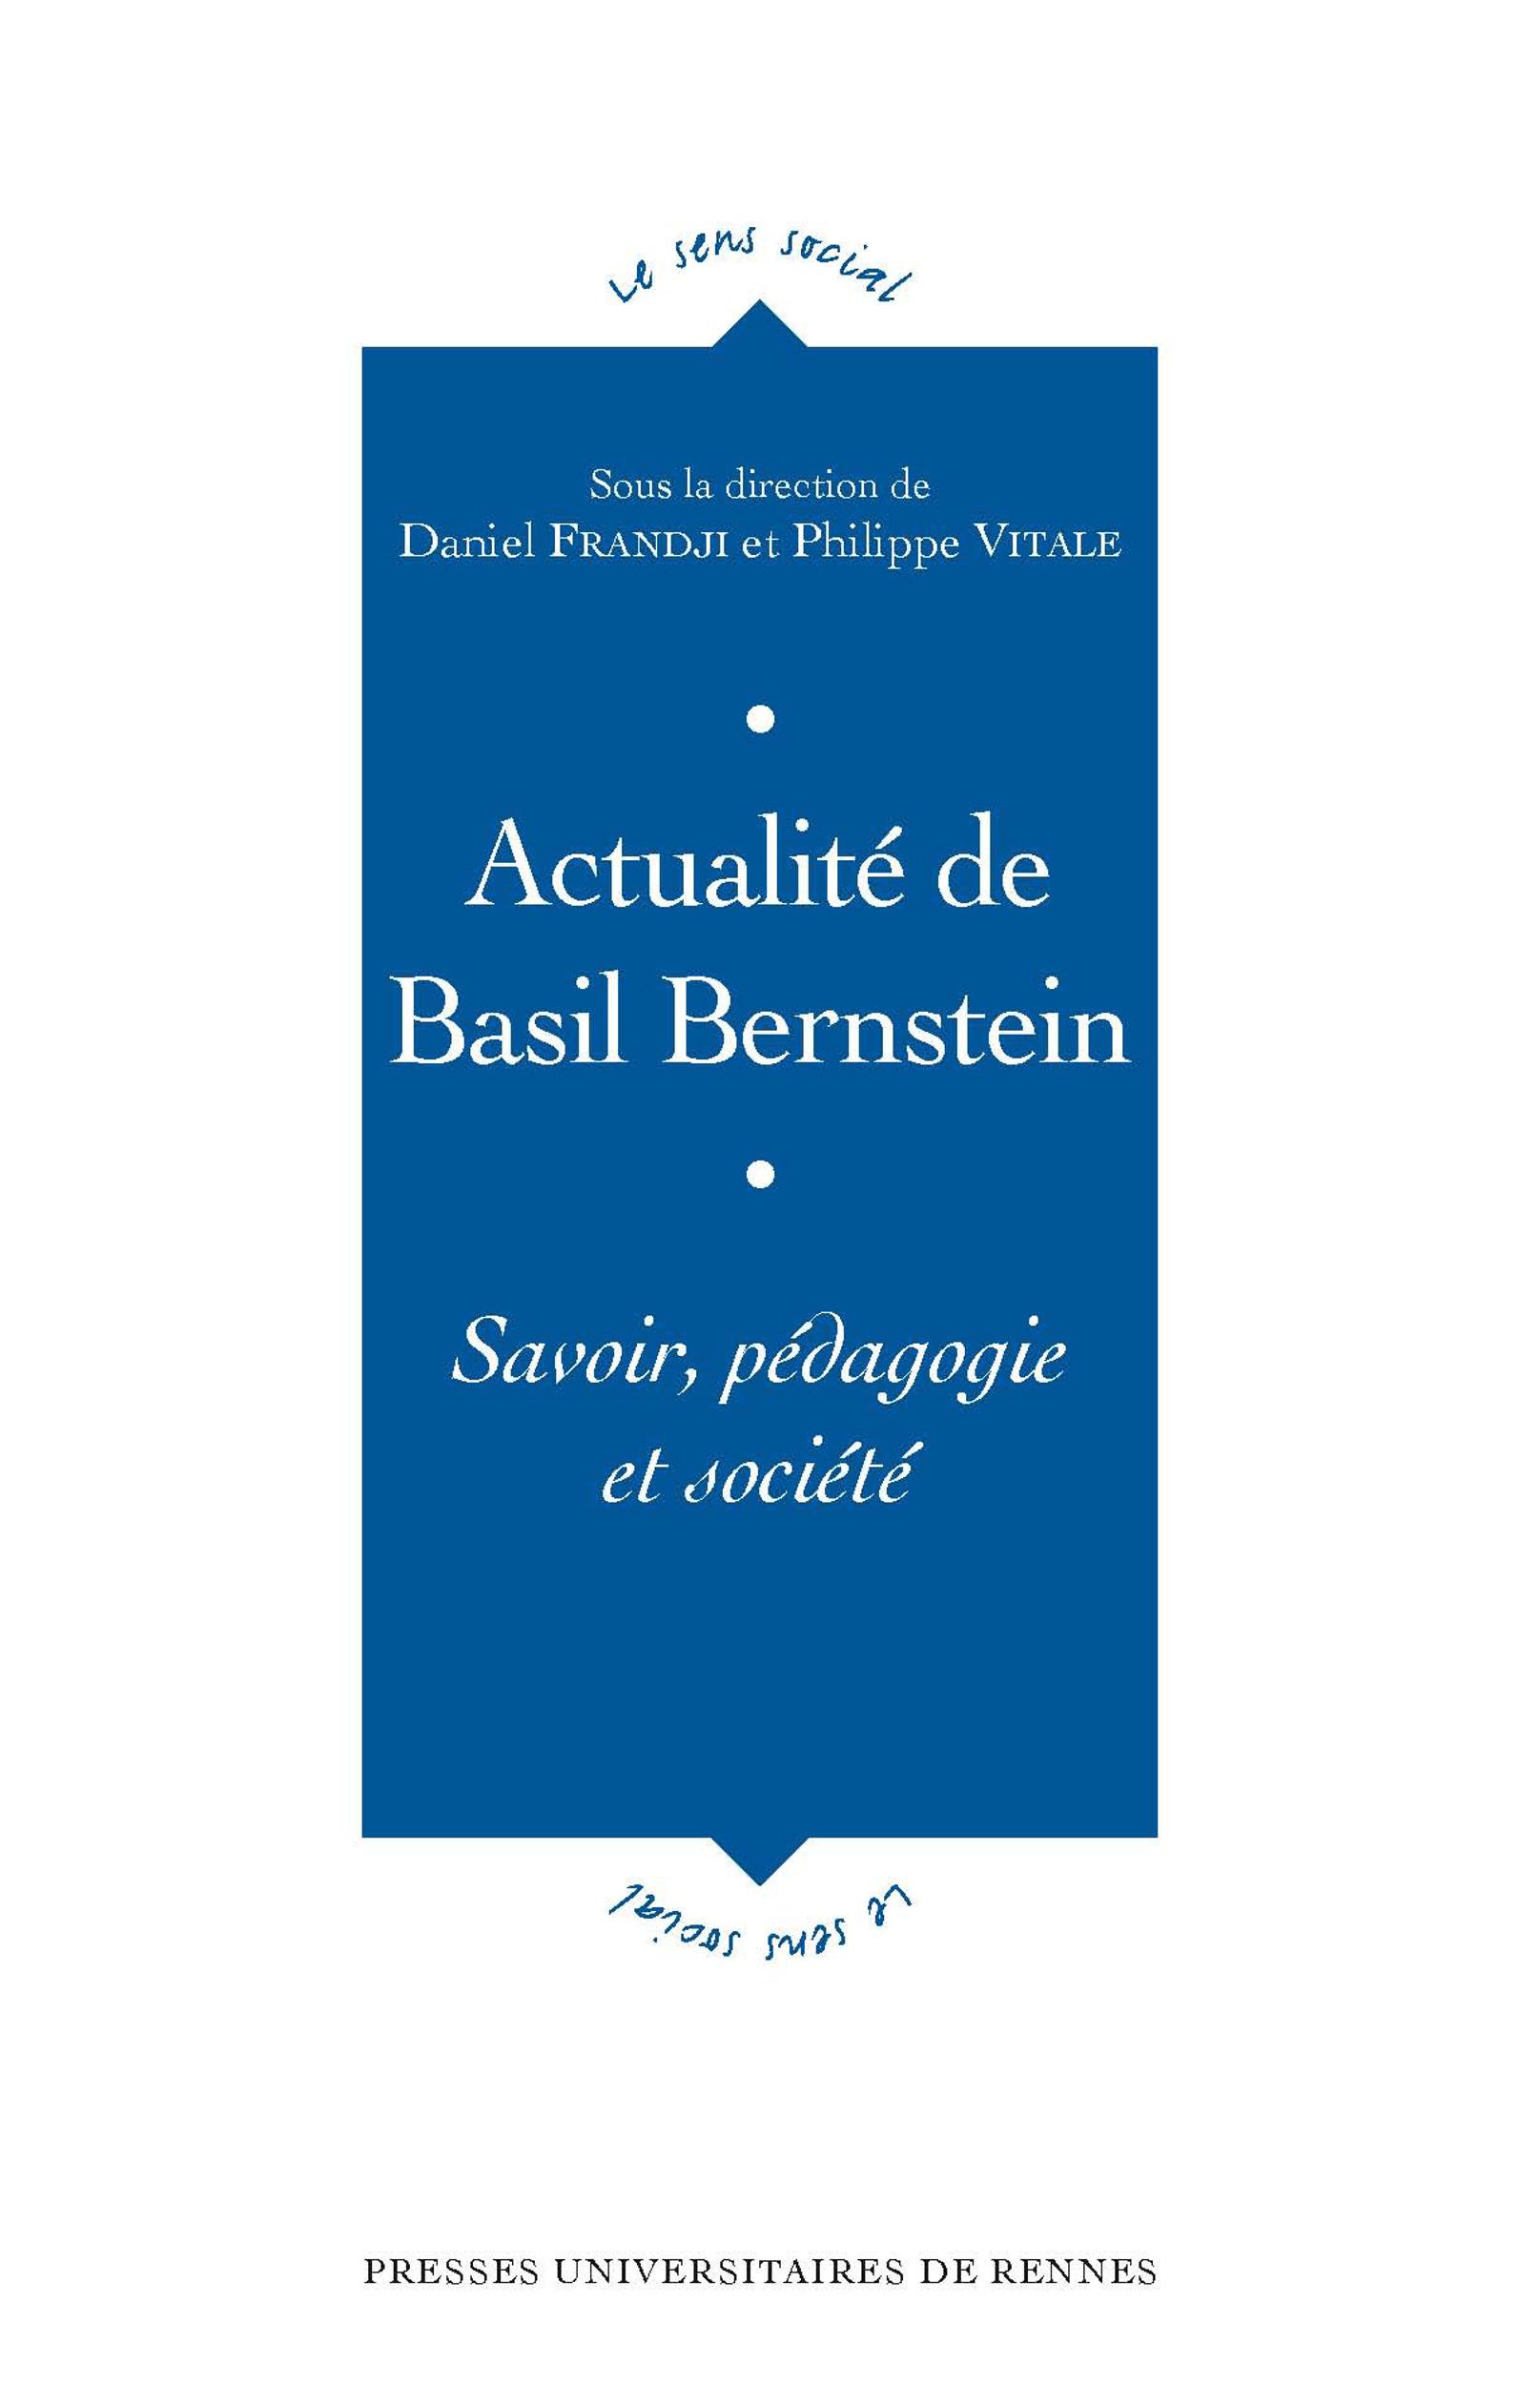 Actualité de Basil Bernstein  - Philippe Vitale  - Daniel Frandji